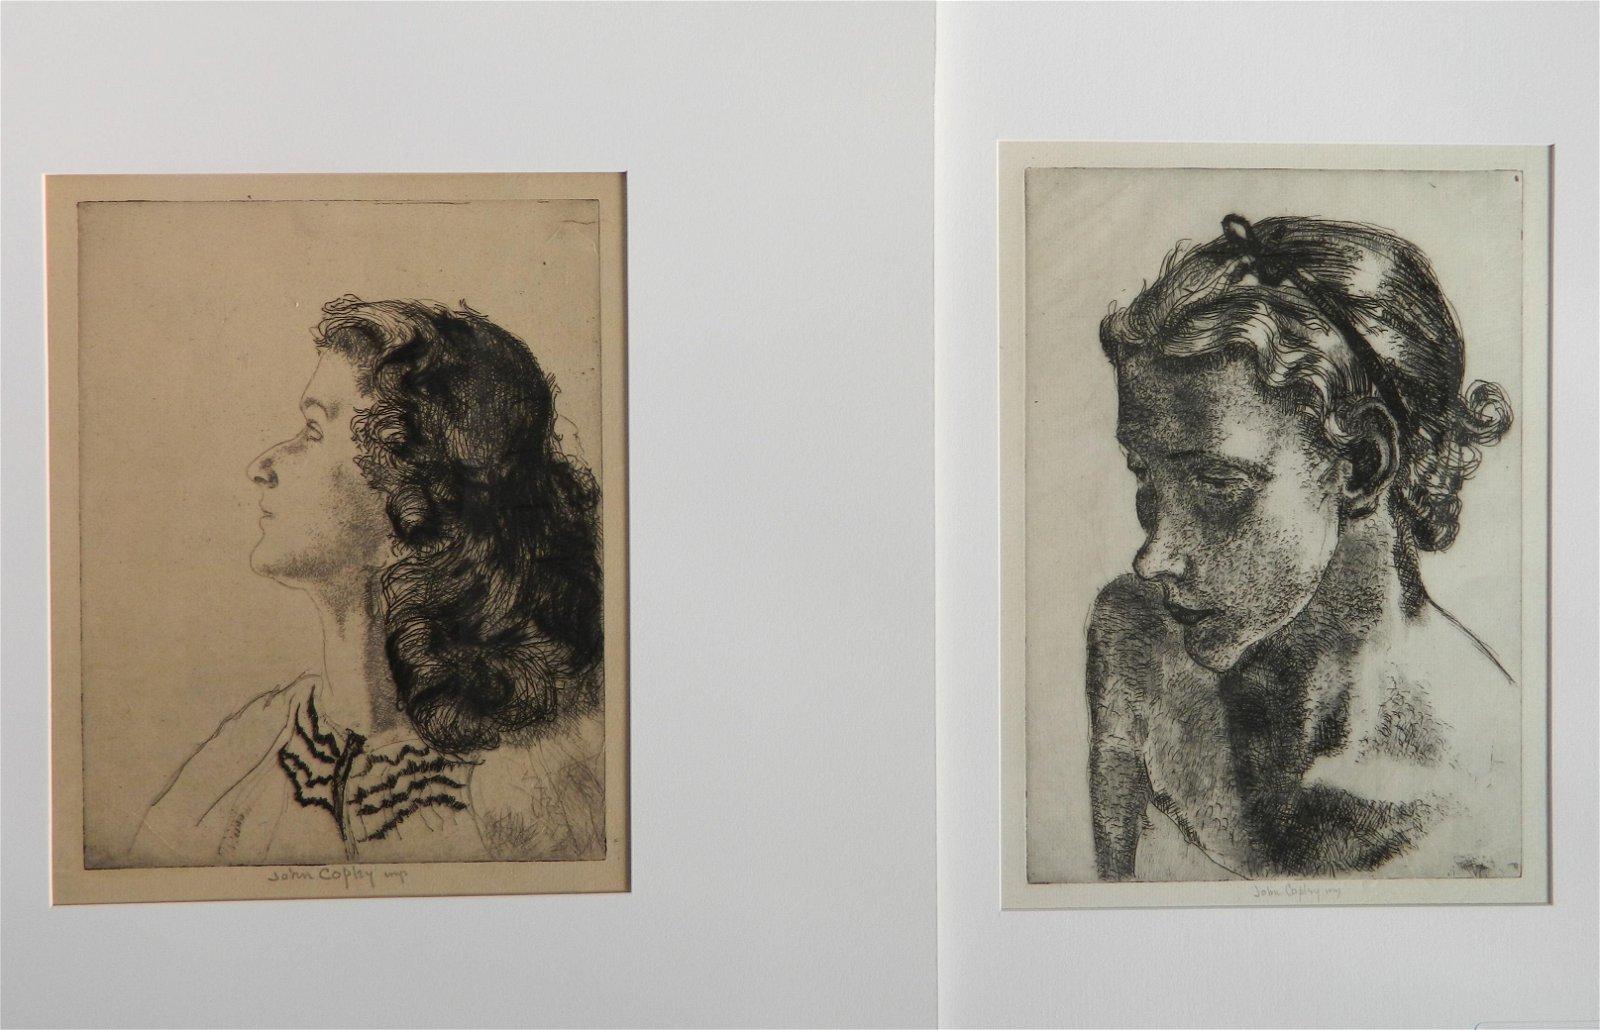 John Copley lithographs